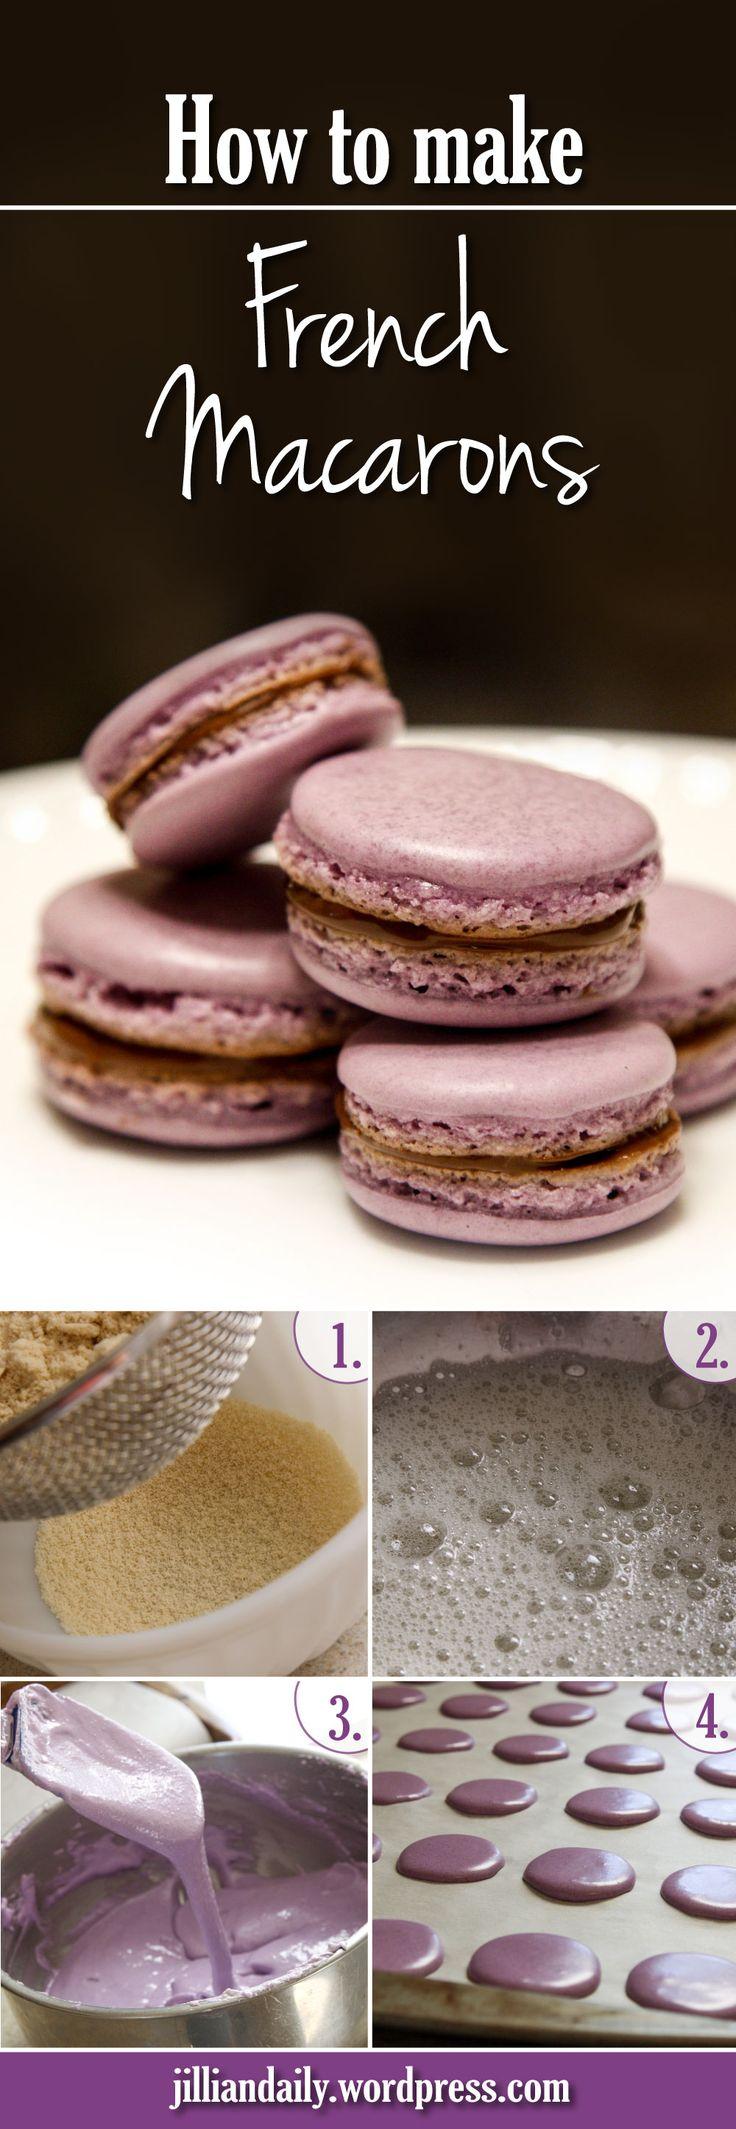 ... on Pinterest | Making Macarons, Macaroons and How To Make Macarons